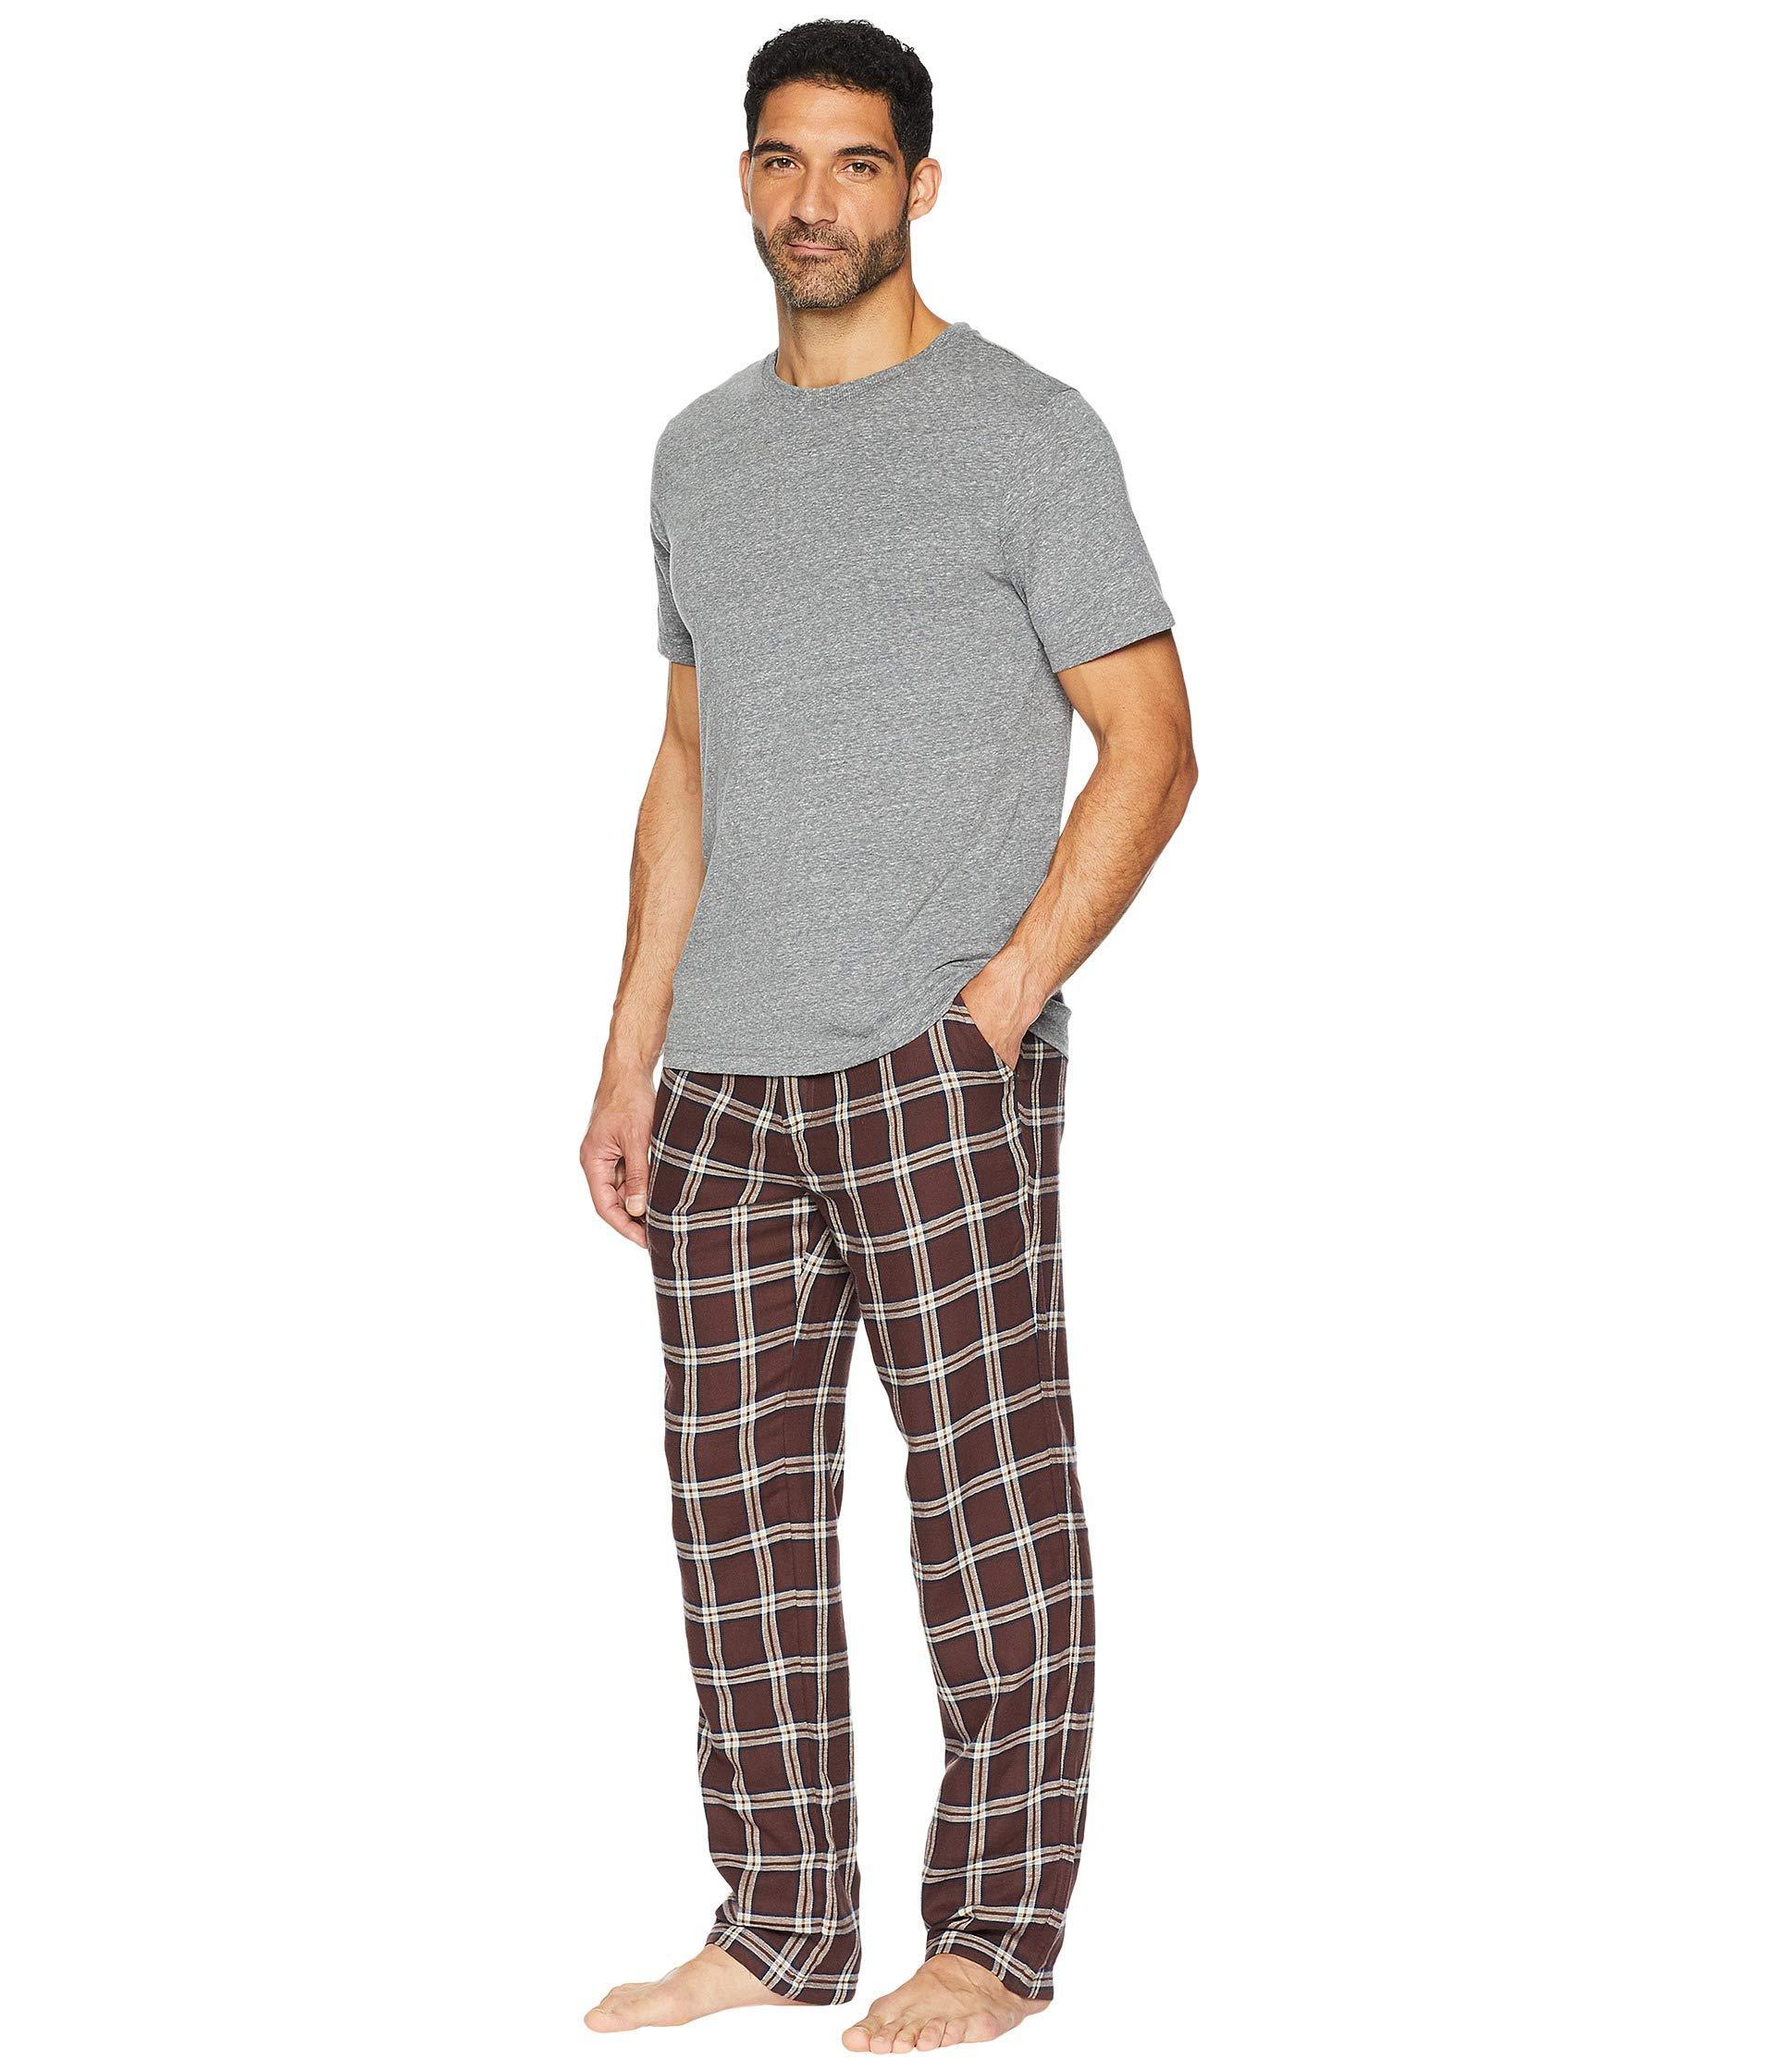 Lyst - UGG Grant Woven Sleepwear Set (port grey Heather) Men s ... 5e6364520